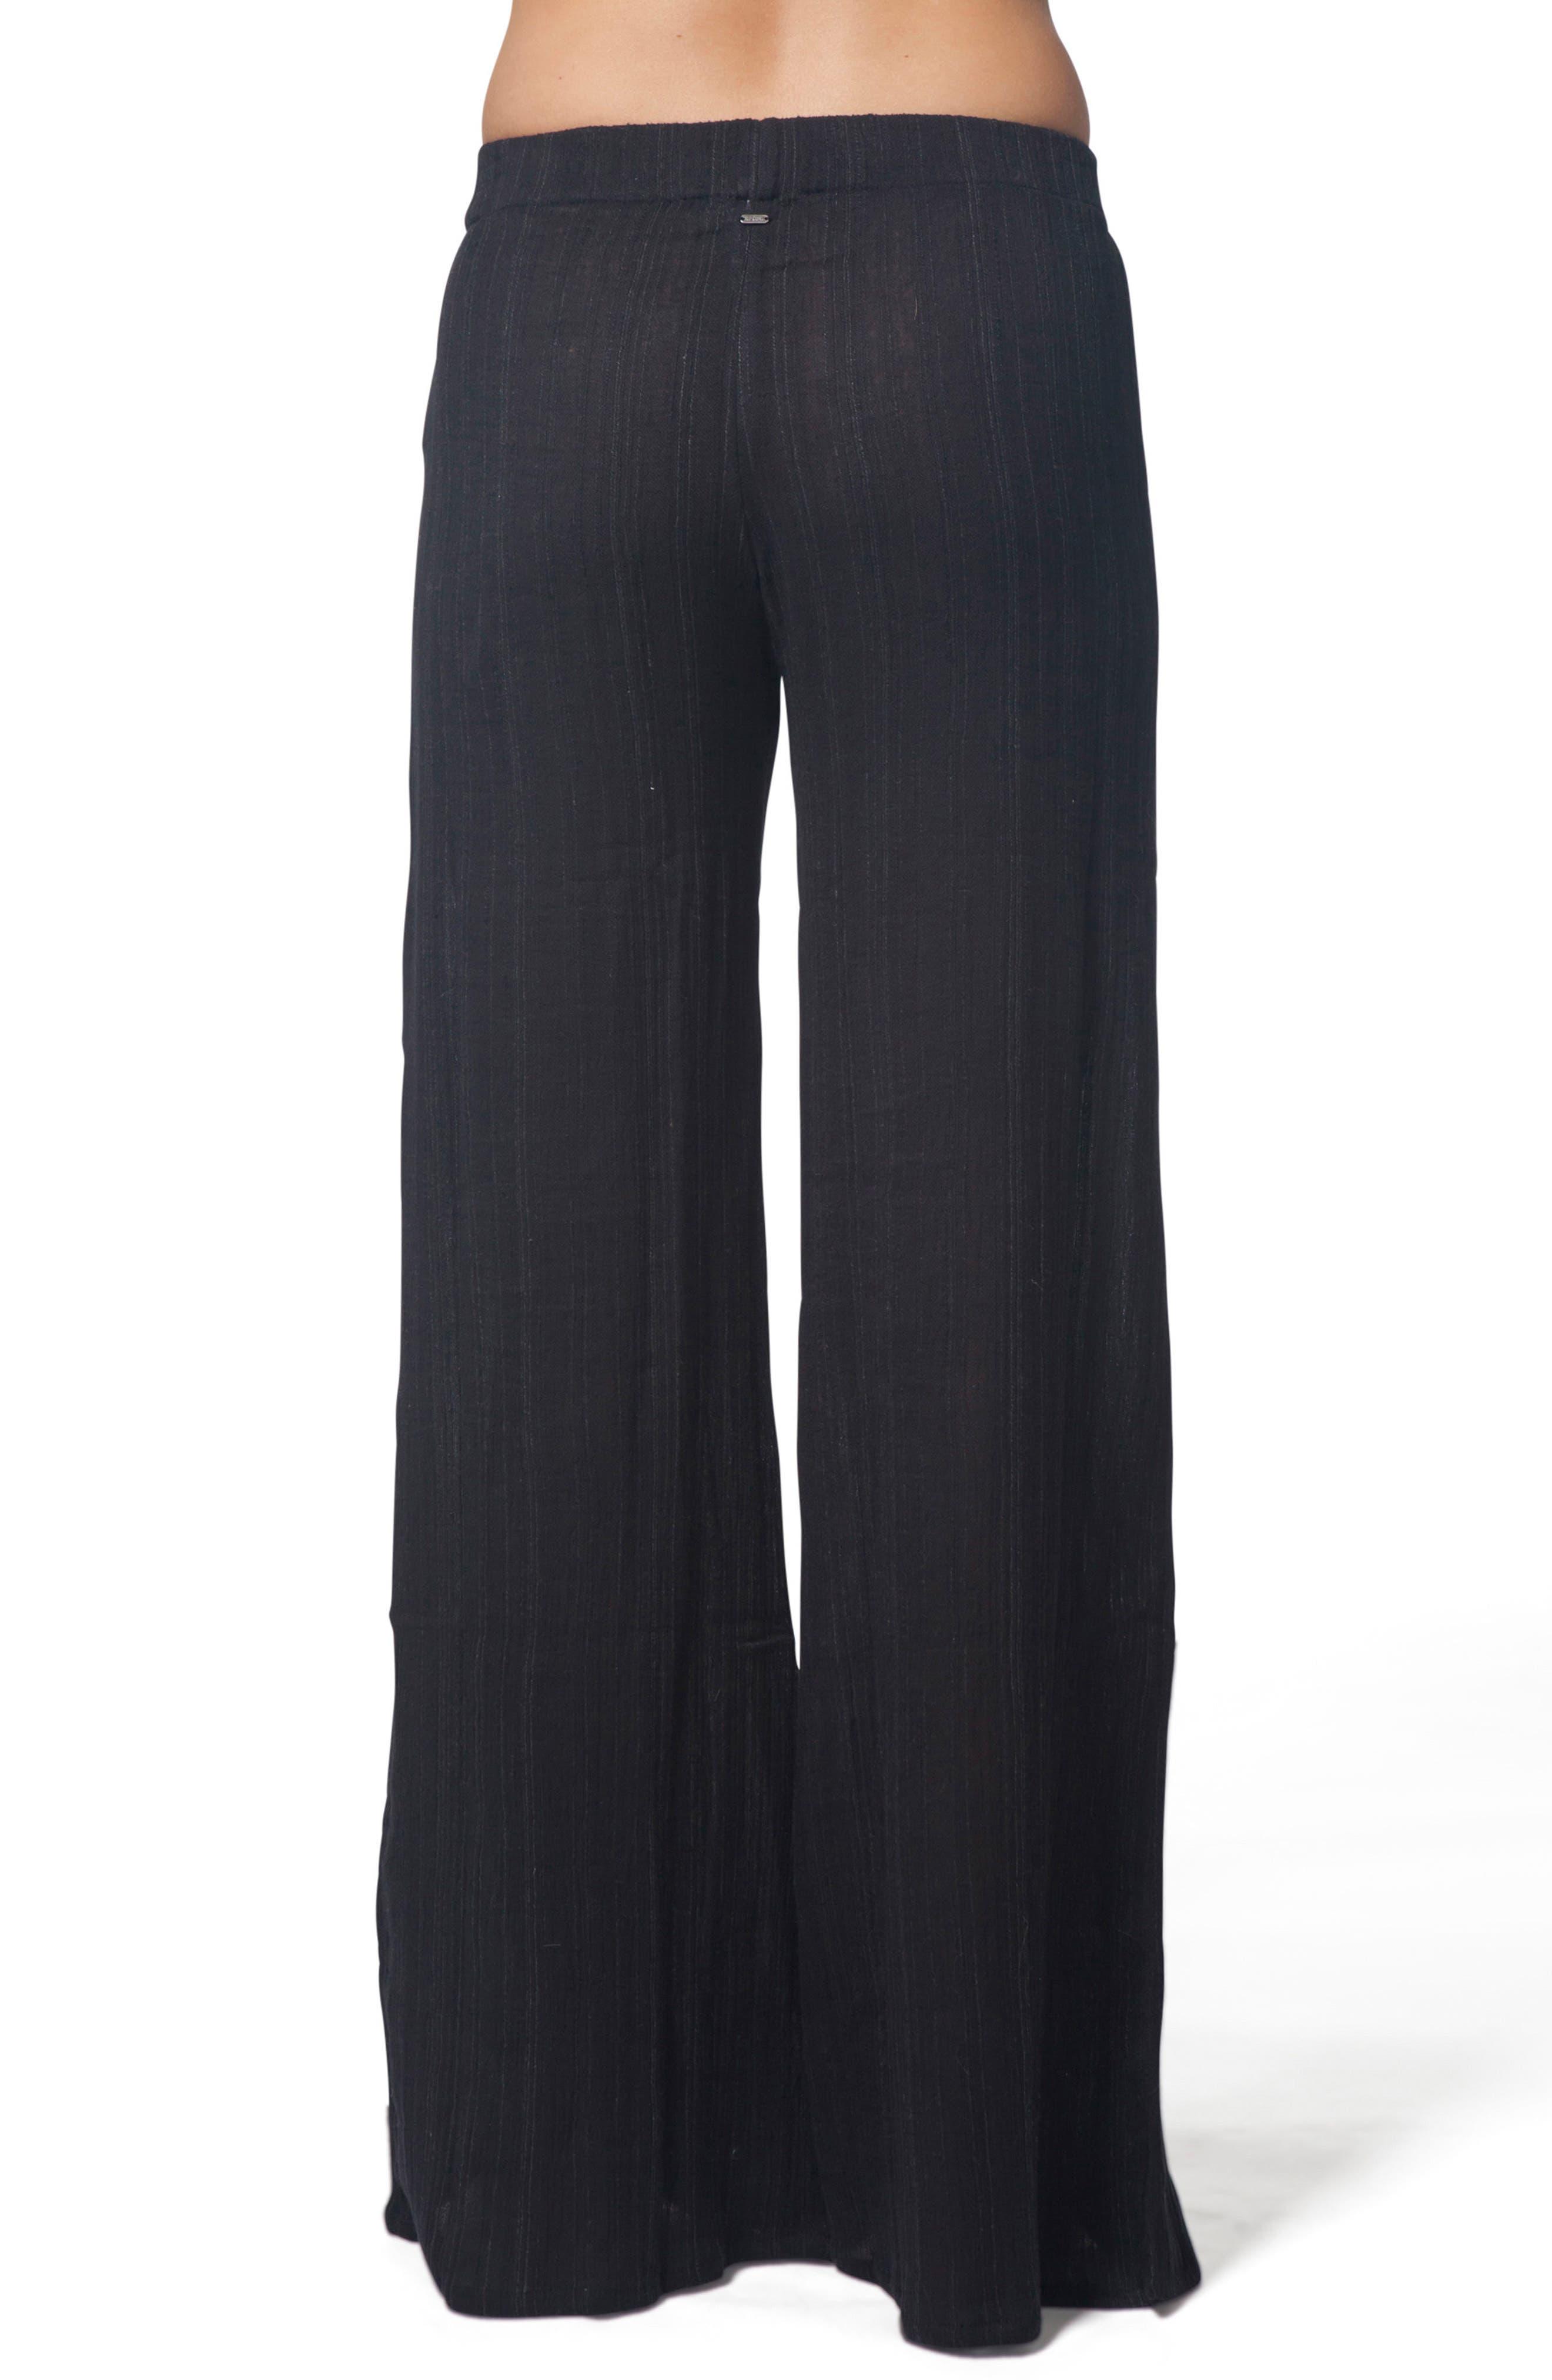 Classic Surf Beach Pants,                             Alternate thumbnail 3, color,                             Black